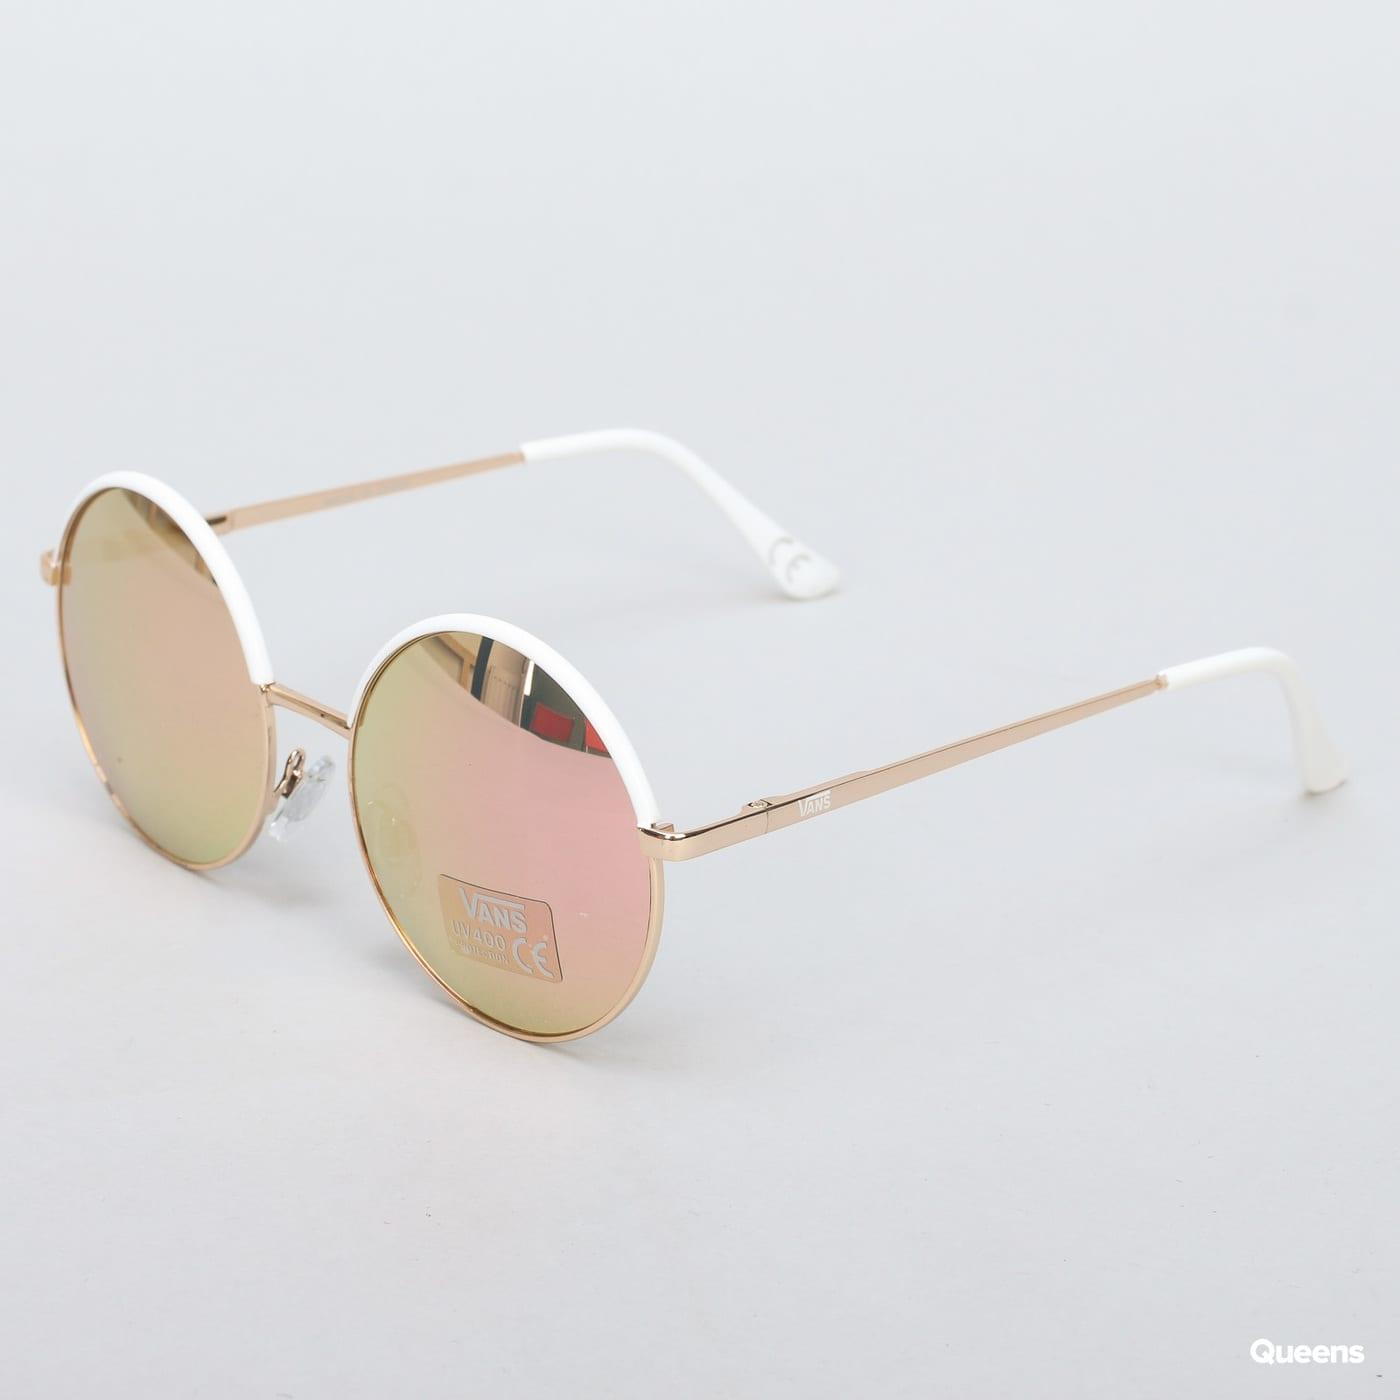 Vans Circle Of Life Sunglasses golden / white